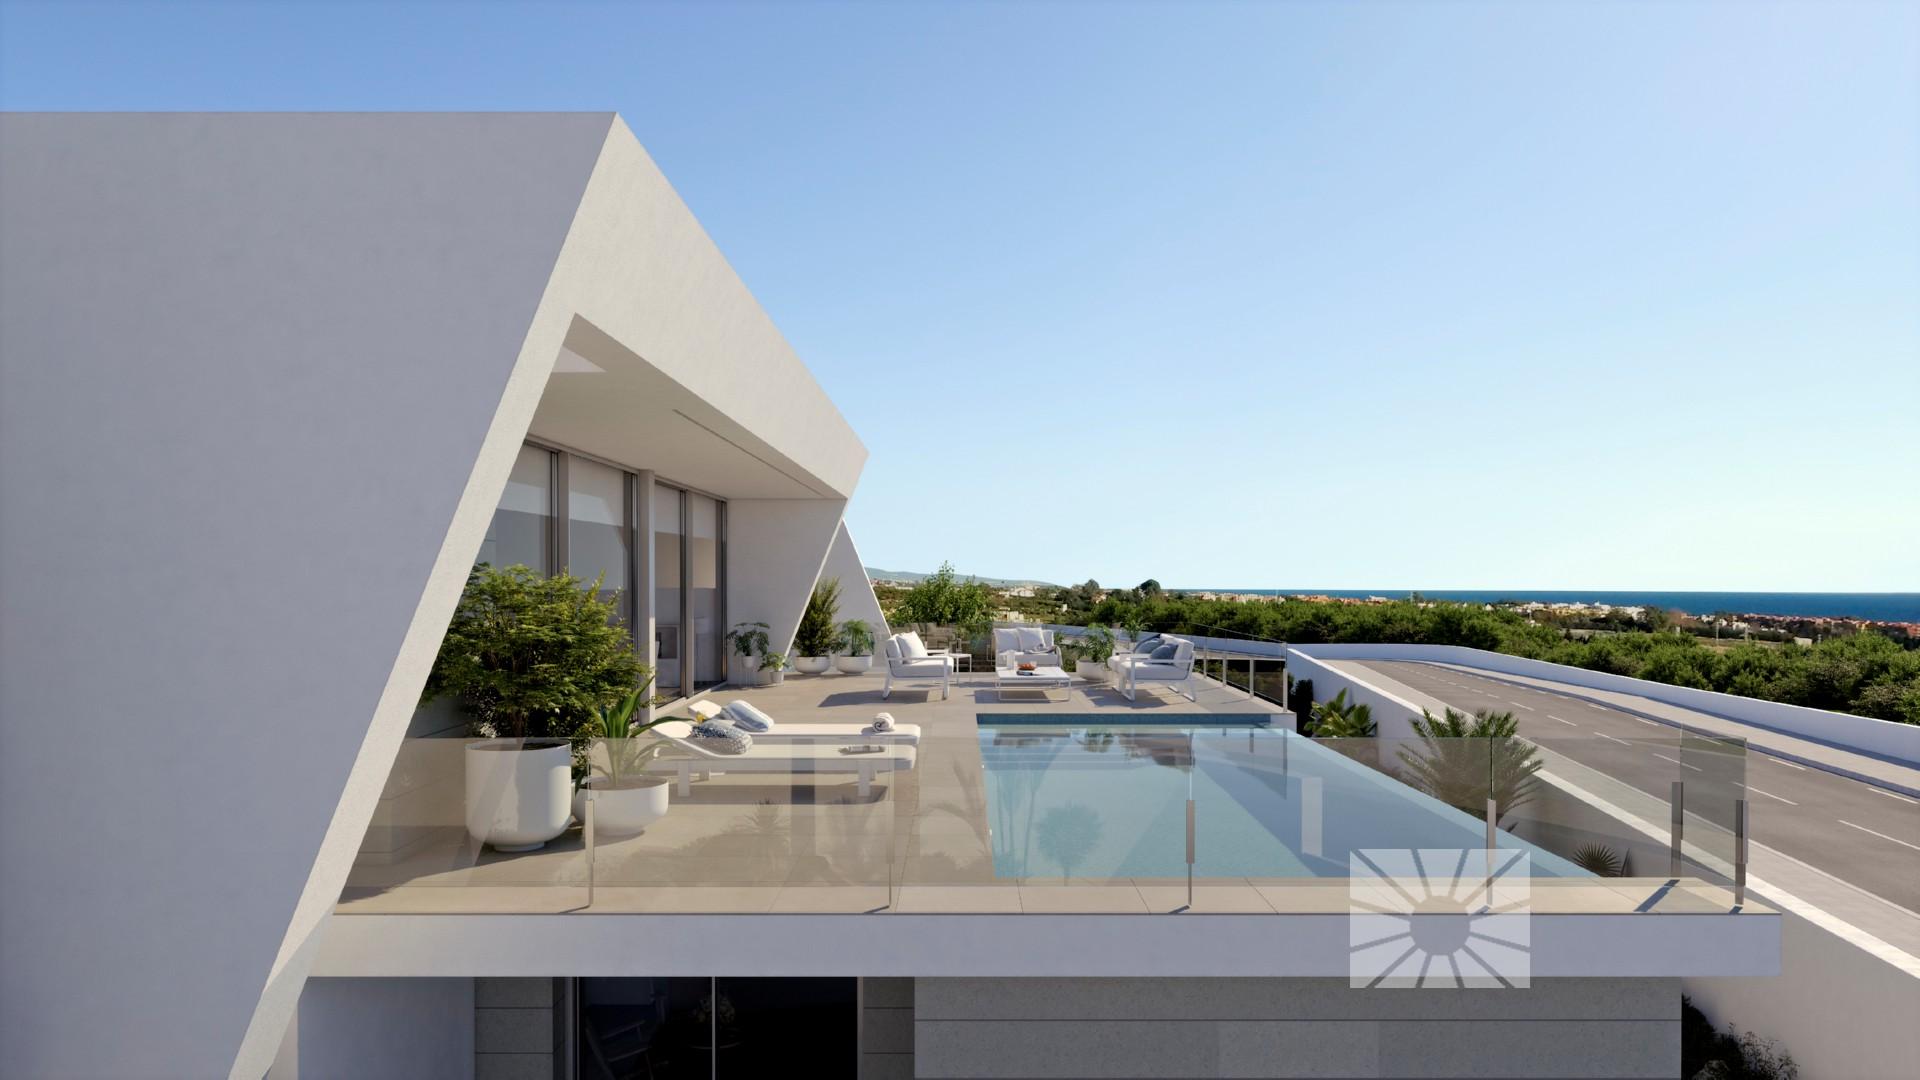 Lirios Design Cumbre del Sol Moderne Villa Zum verkauf ref: AL176 ...